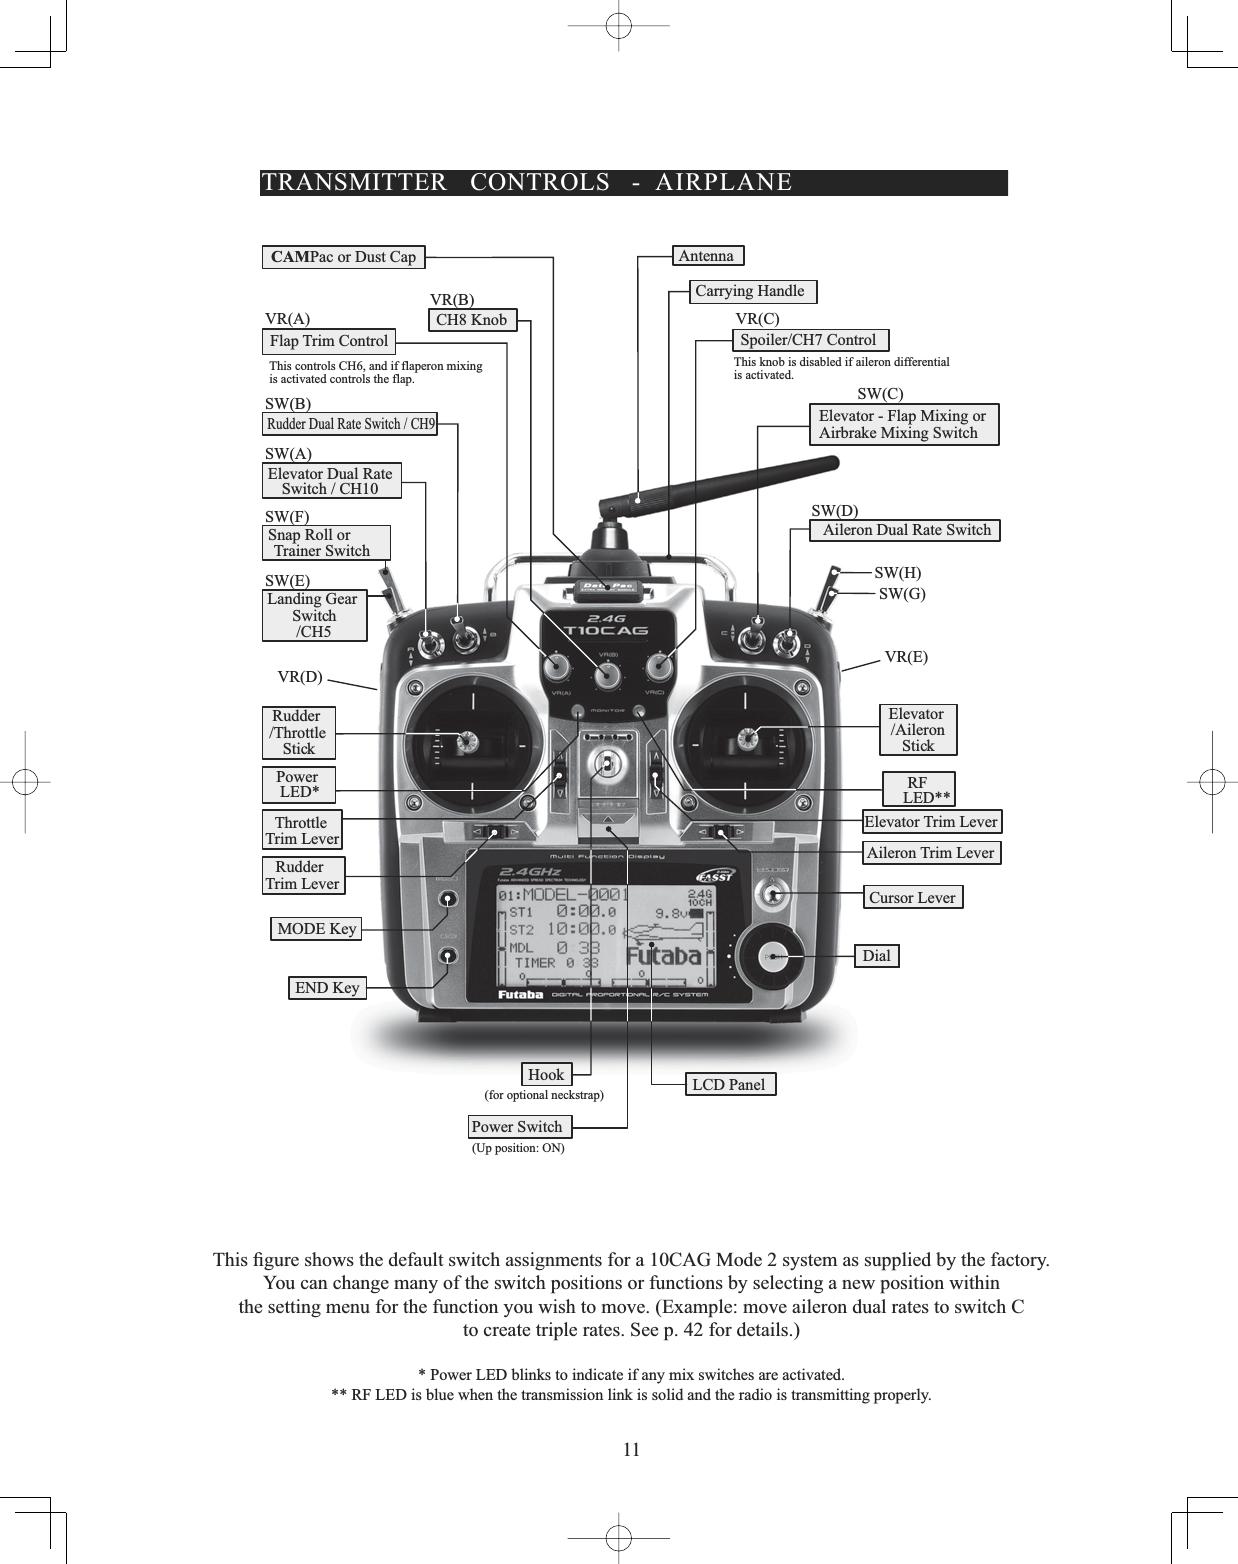 Futaba T10CG-24G Radio Control(Transmitter) User Manual